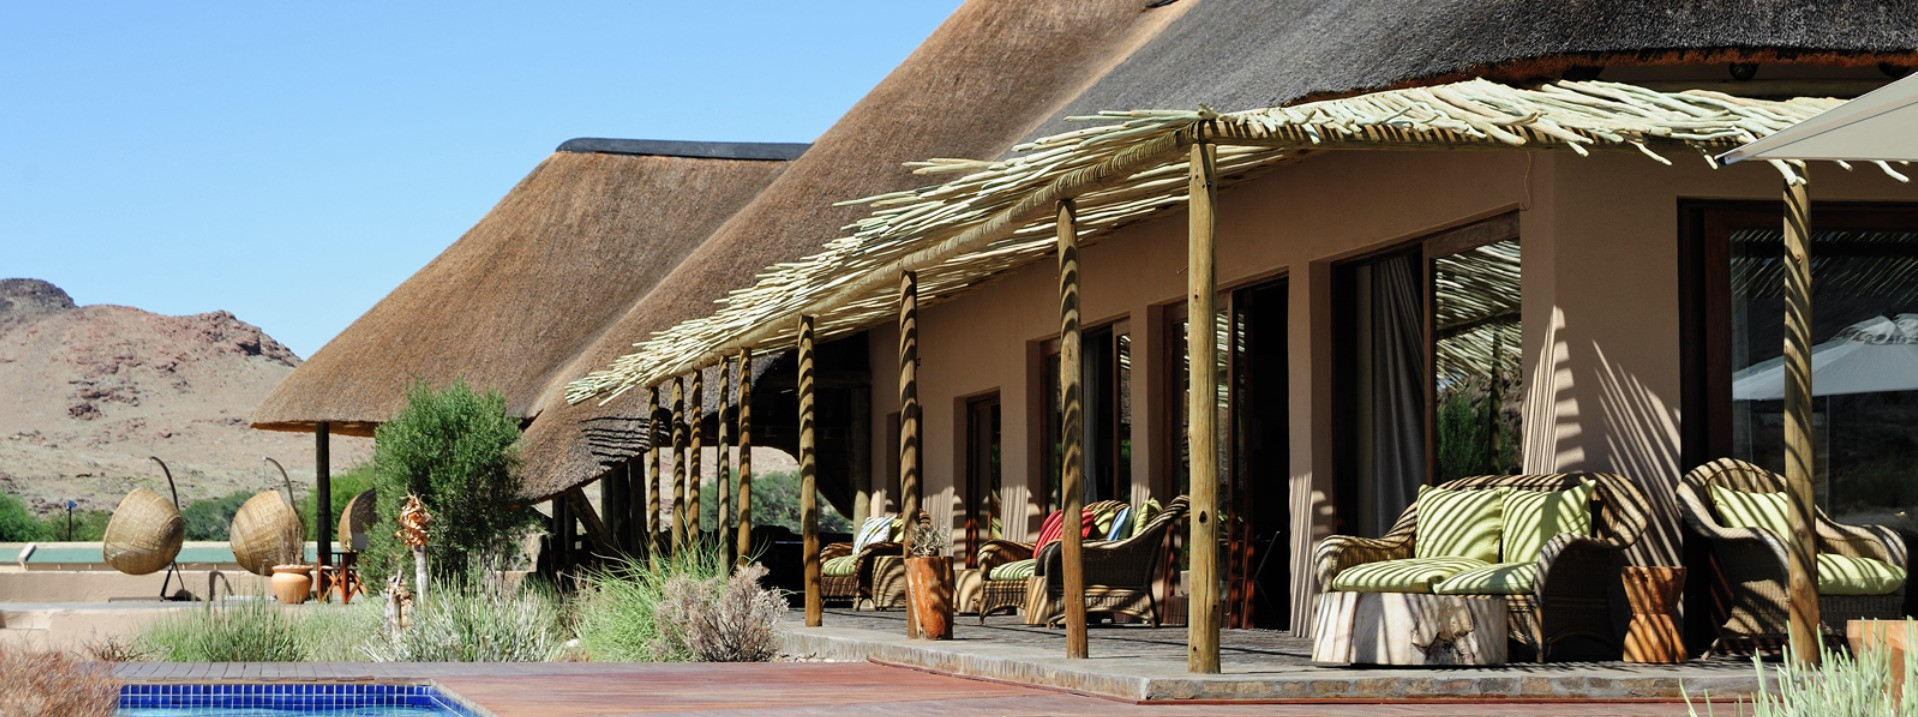 062%20Sandfontein%20Lodge_edited.jpg